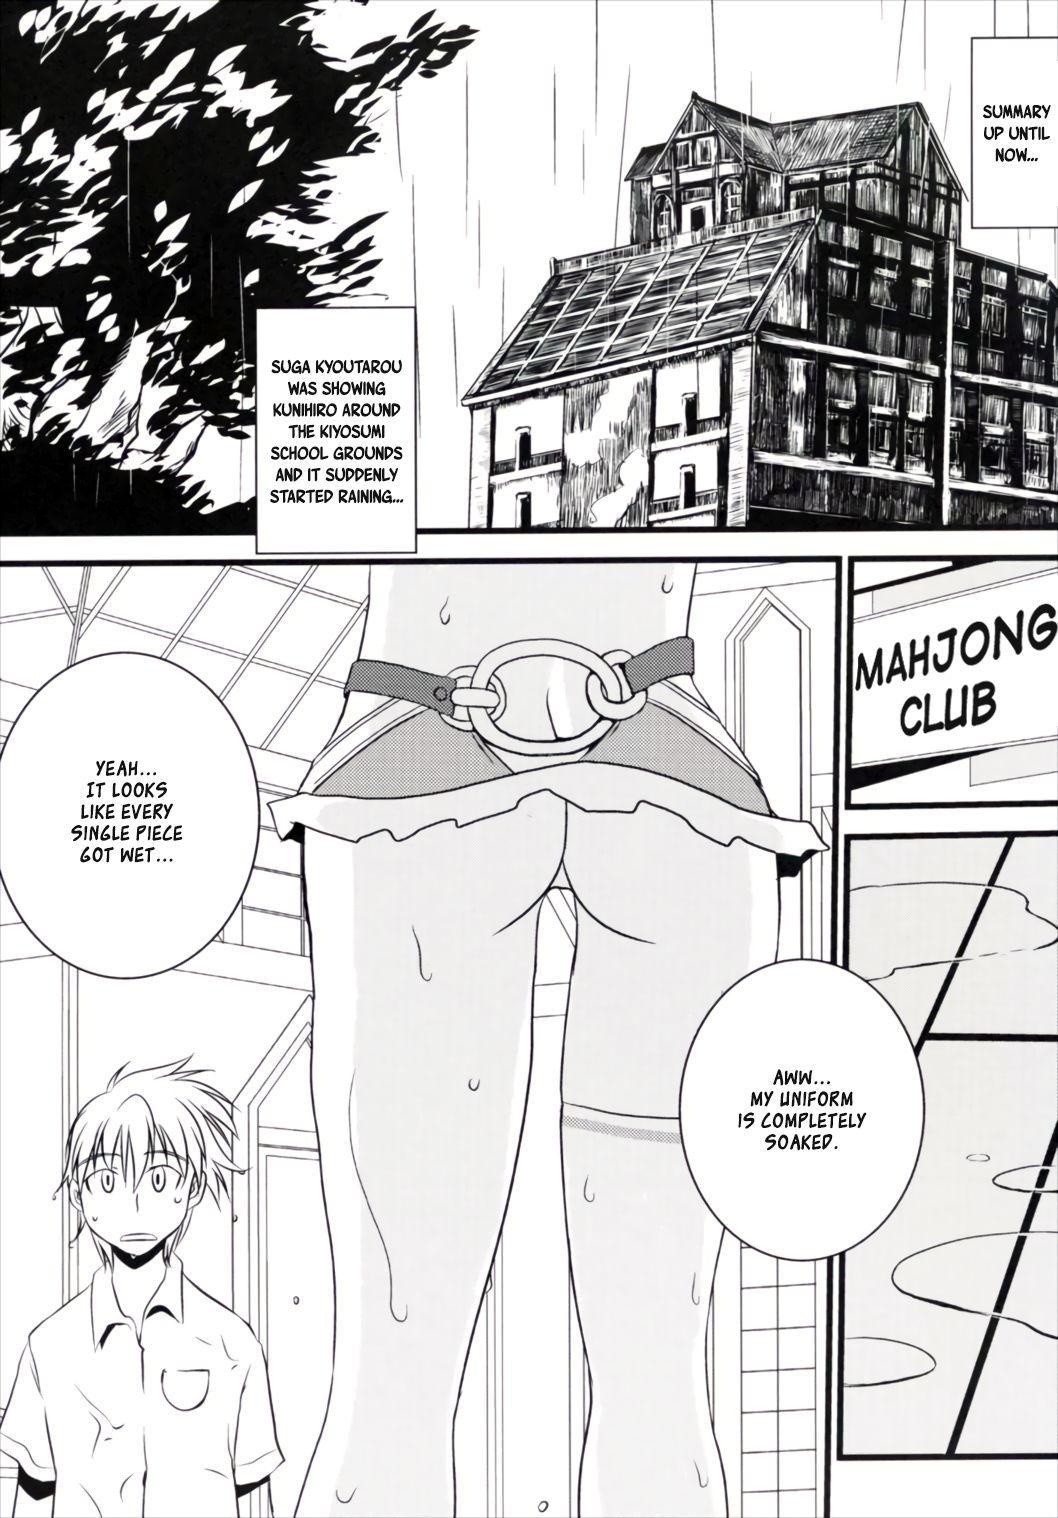 Hajimete no Sailor Fuku | Hajime's First Sailor Suit 2